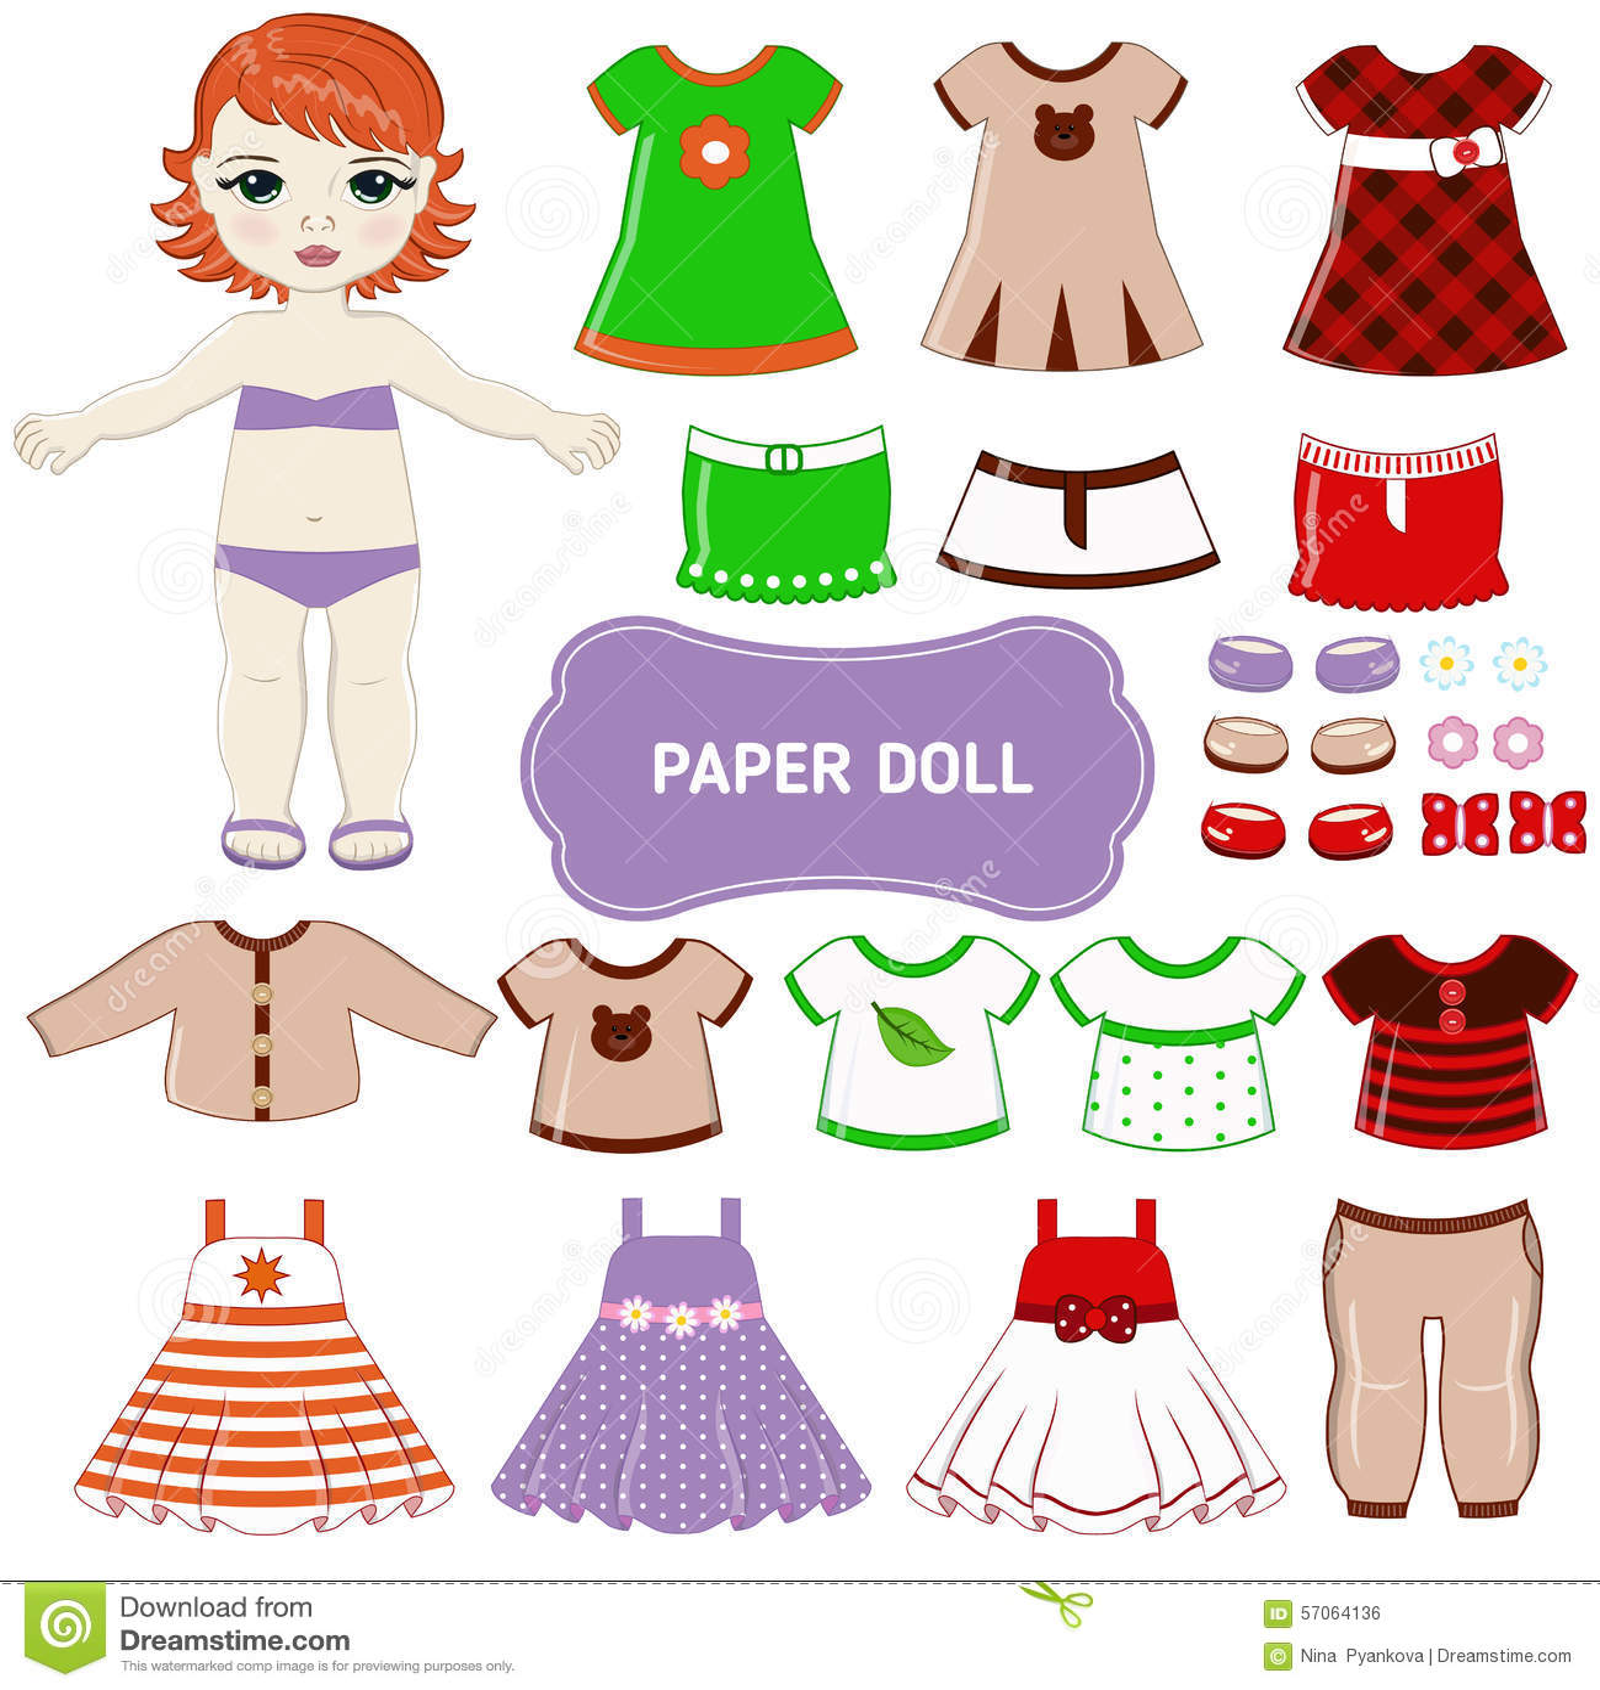 Doll dreams essay Research paper Service qdessaycdka.dedup.info